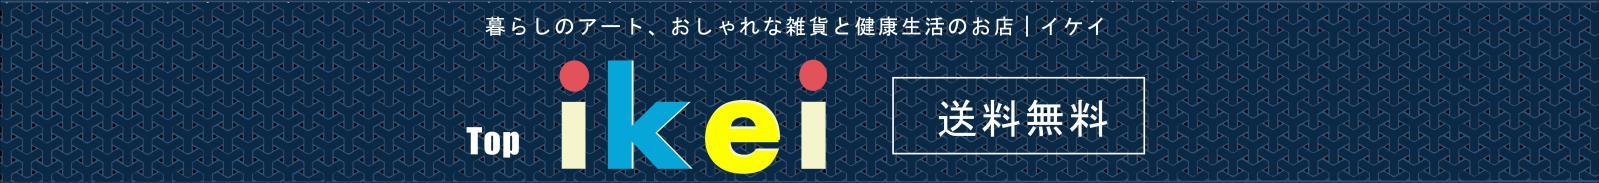 ikei楽天市場店:スマホグッズ販売の専門店です。独自なブランドがあり、大量注文も可能。